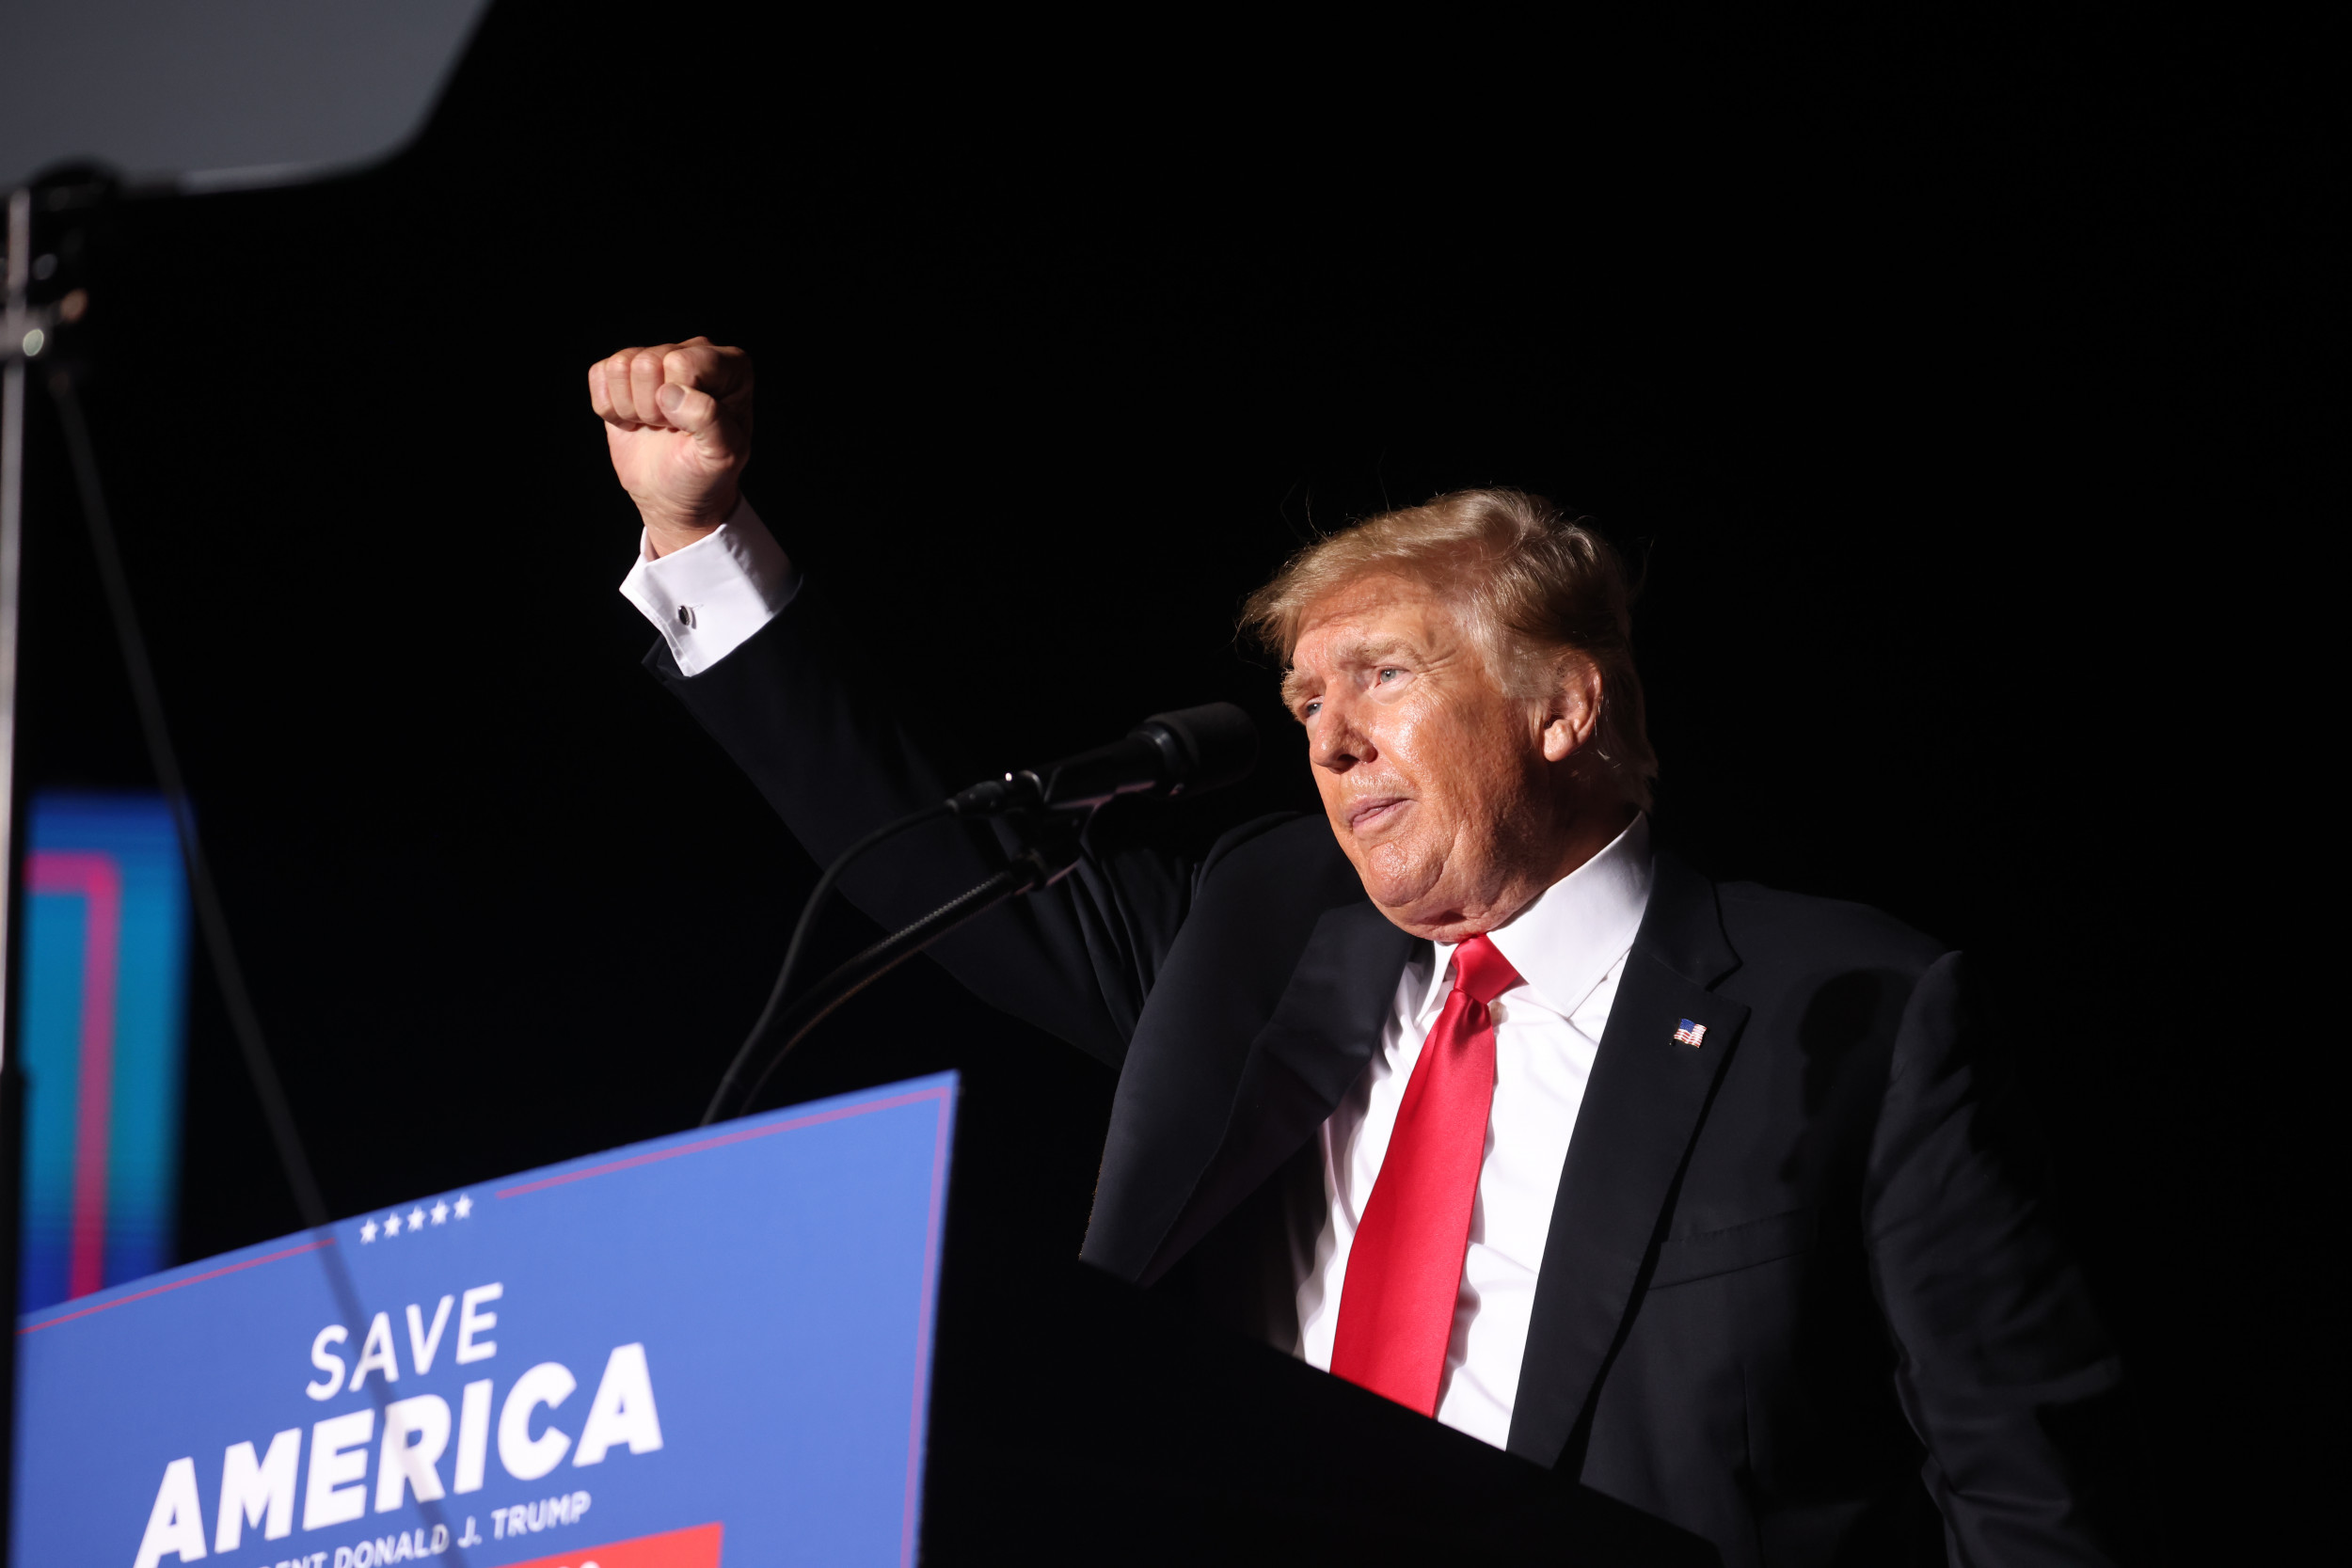 donald trump reinstated president republicans maga poll